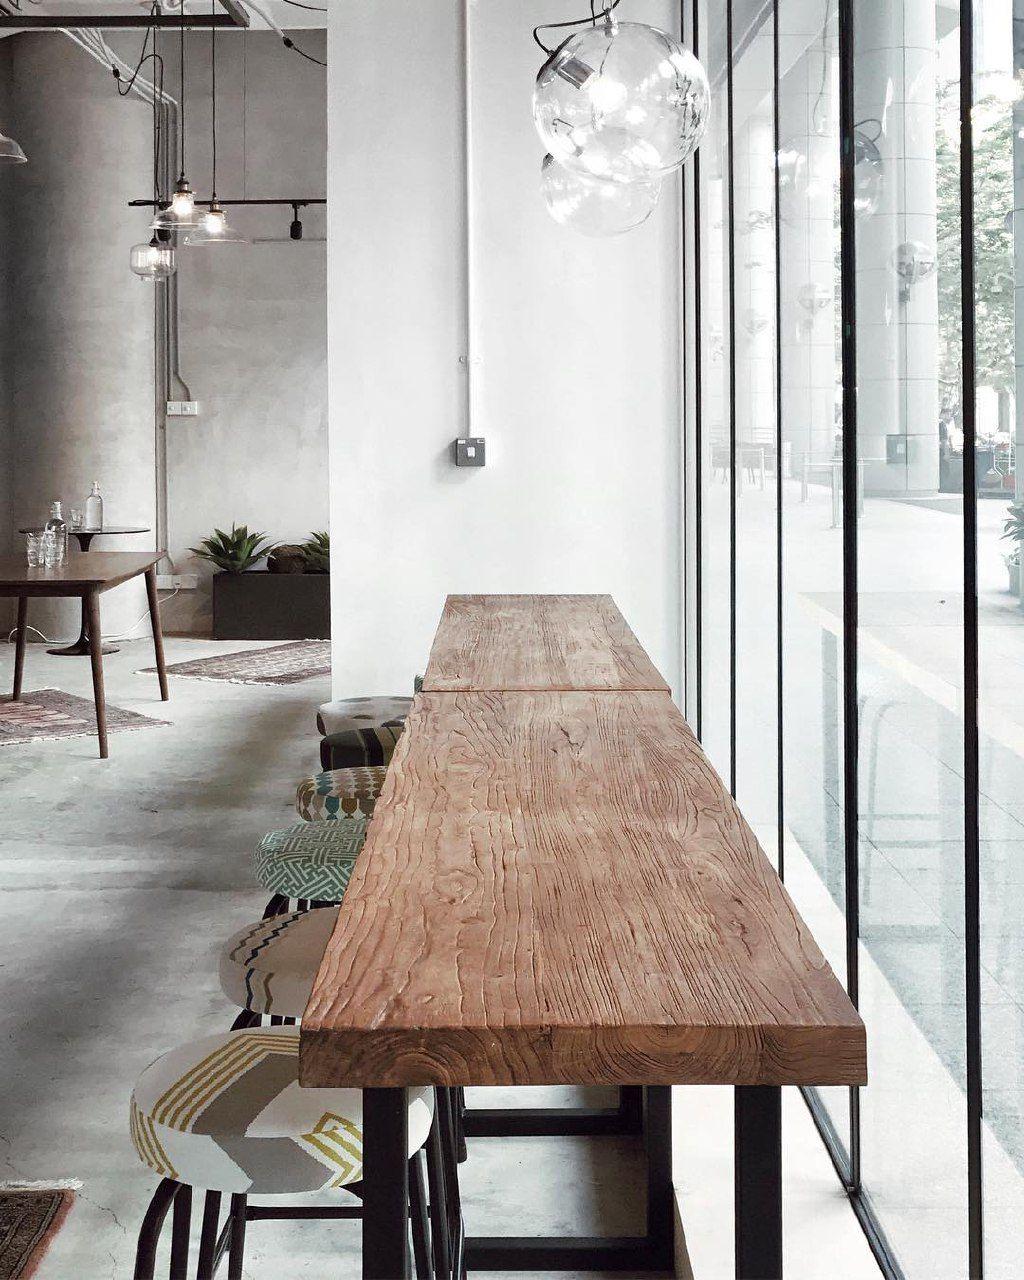 New Restaurants Mar 2018 - Wakey Wakey Ambience